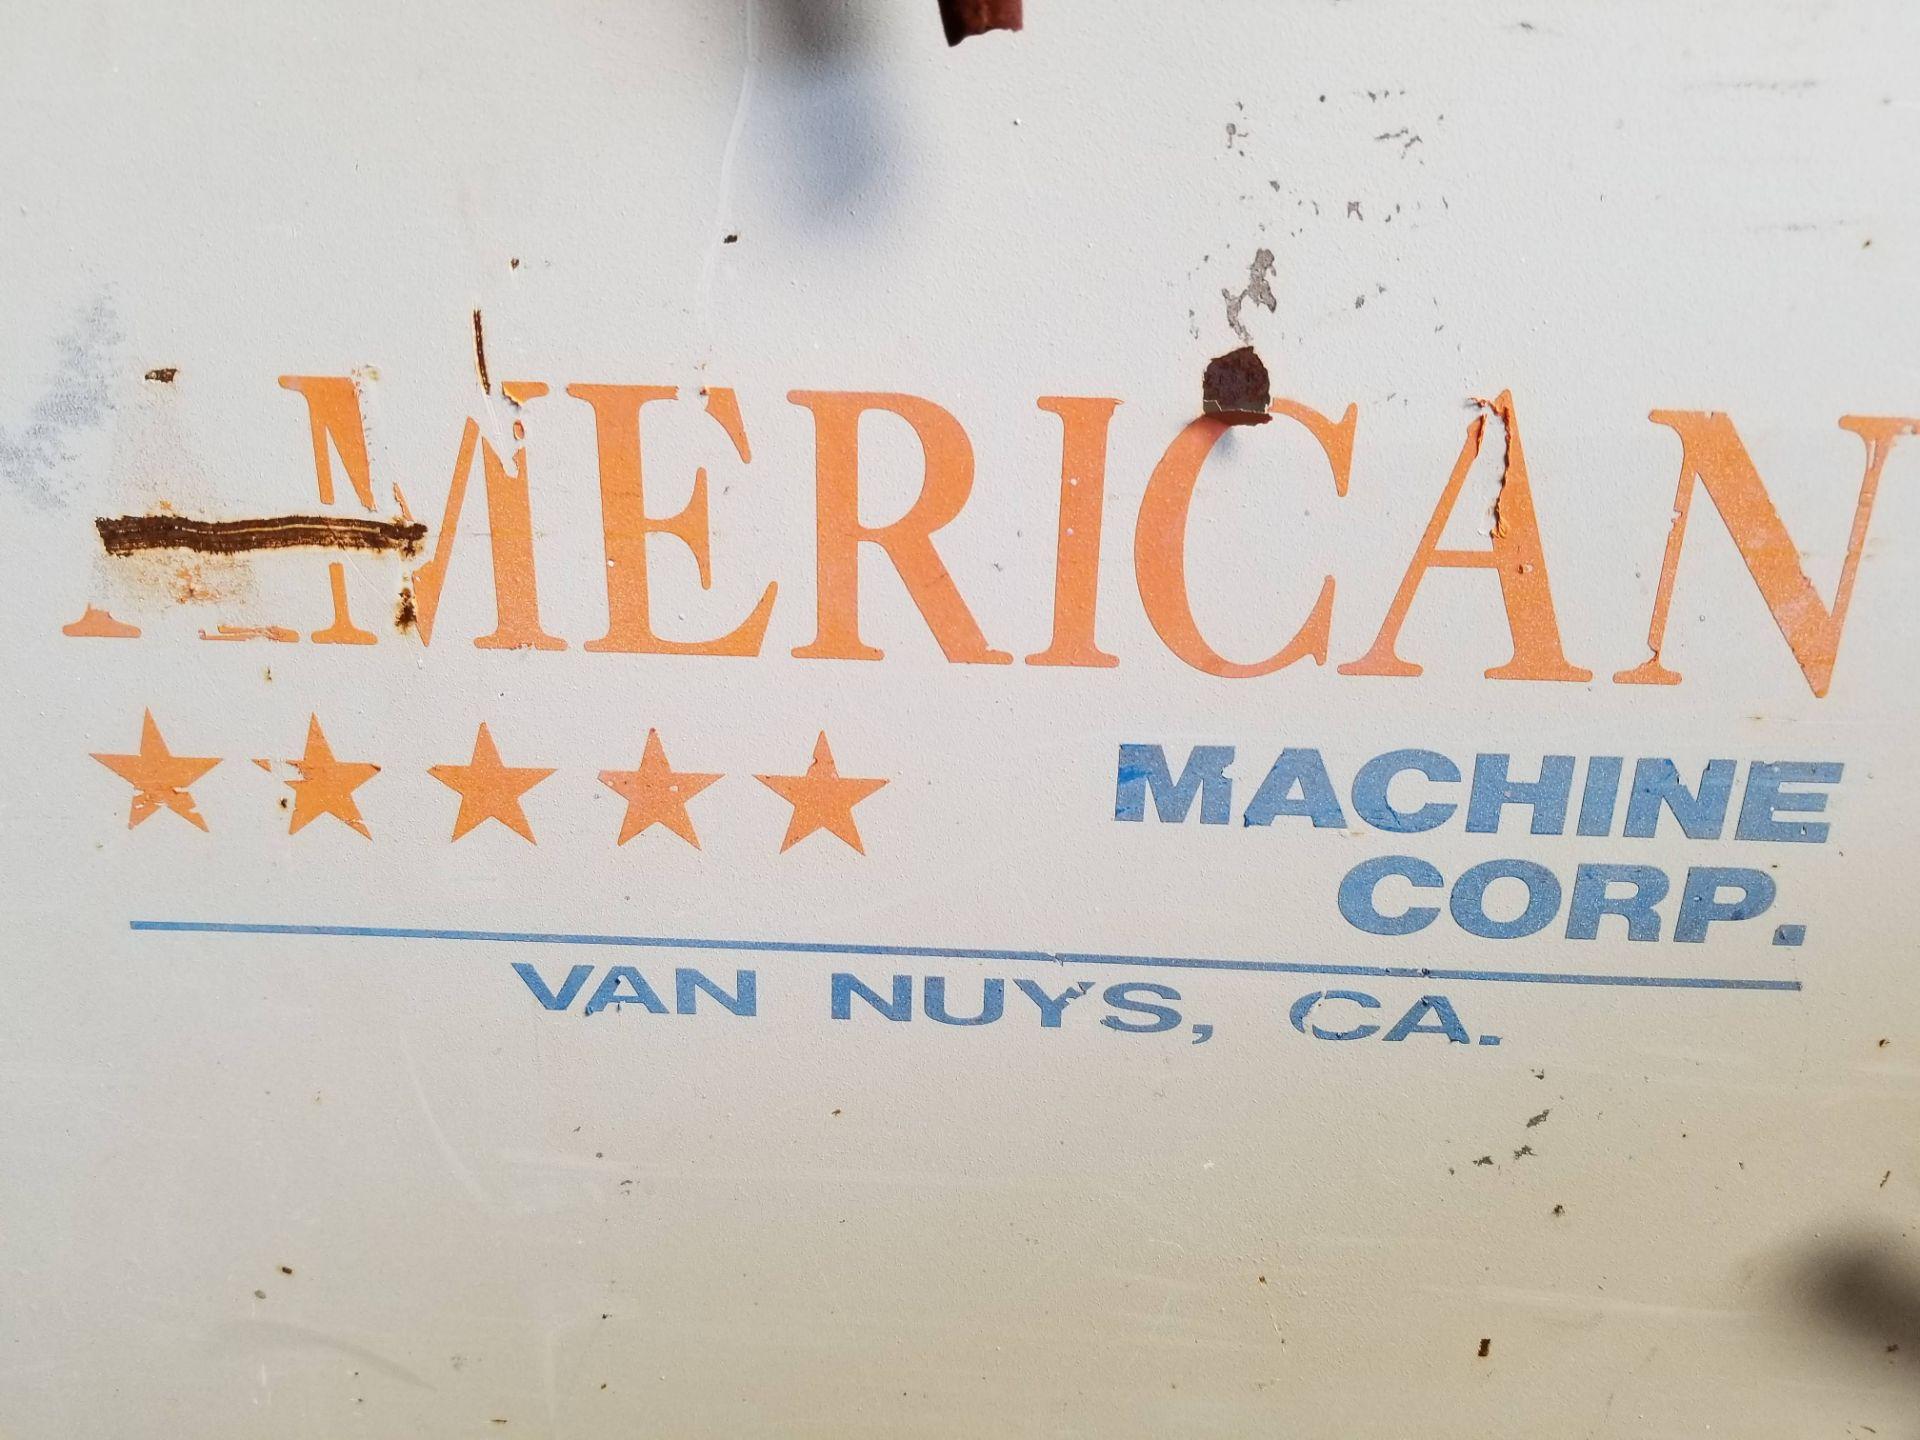 Lot 2 - American Machine Corp 6 head moulding sander, 7 - Baldor 220V 3ph Motors, Model #LFN4066TR, with a